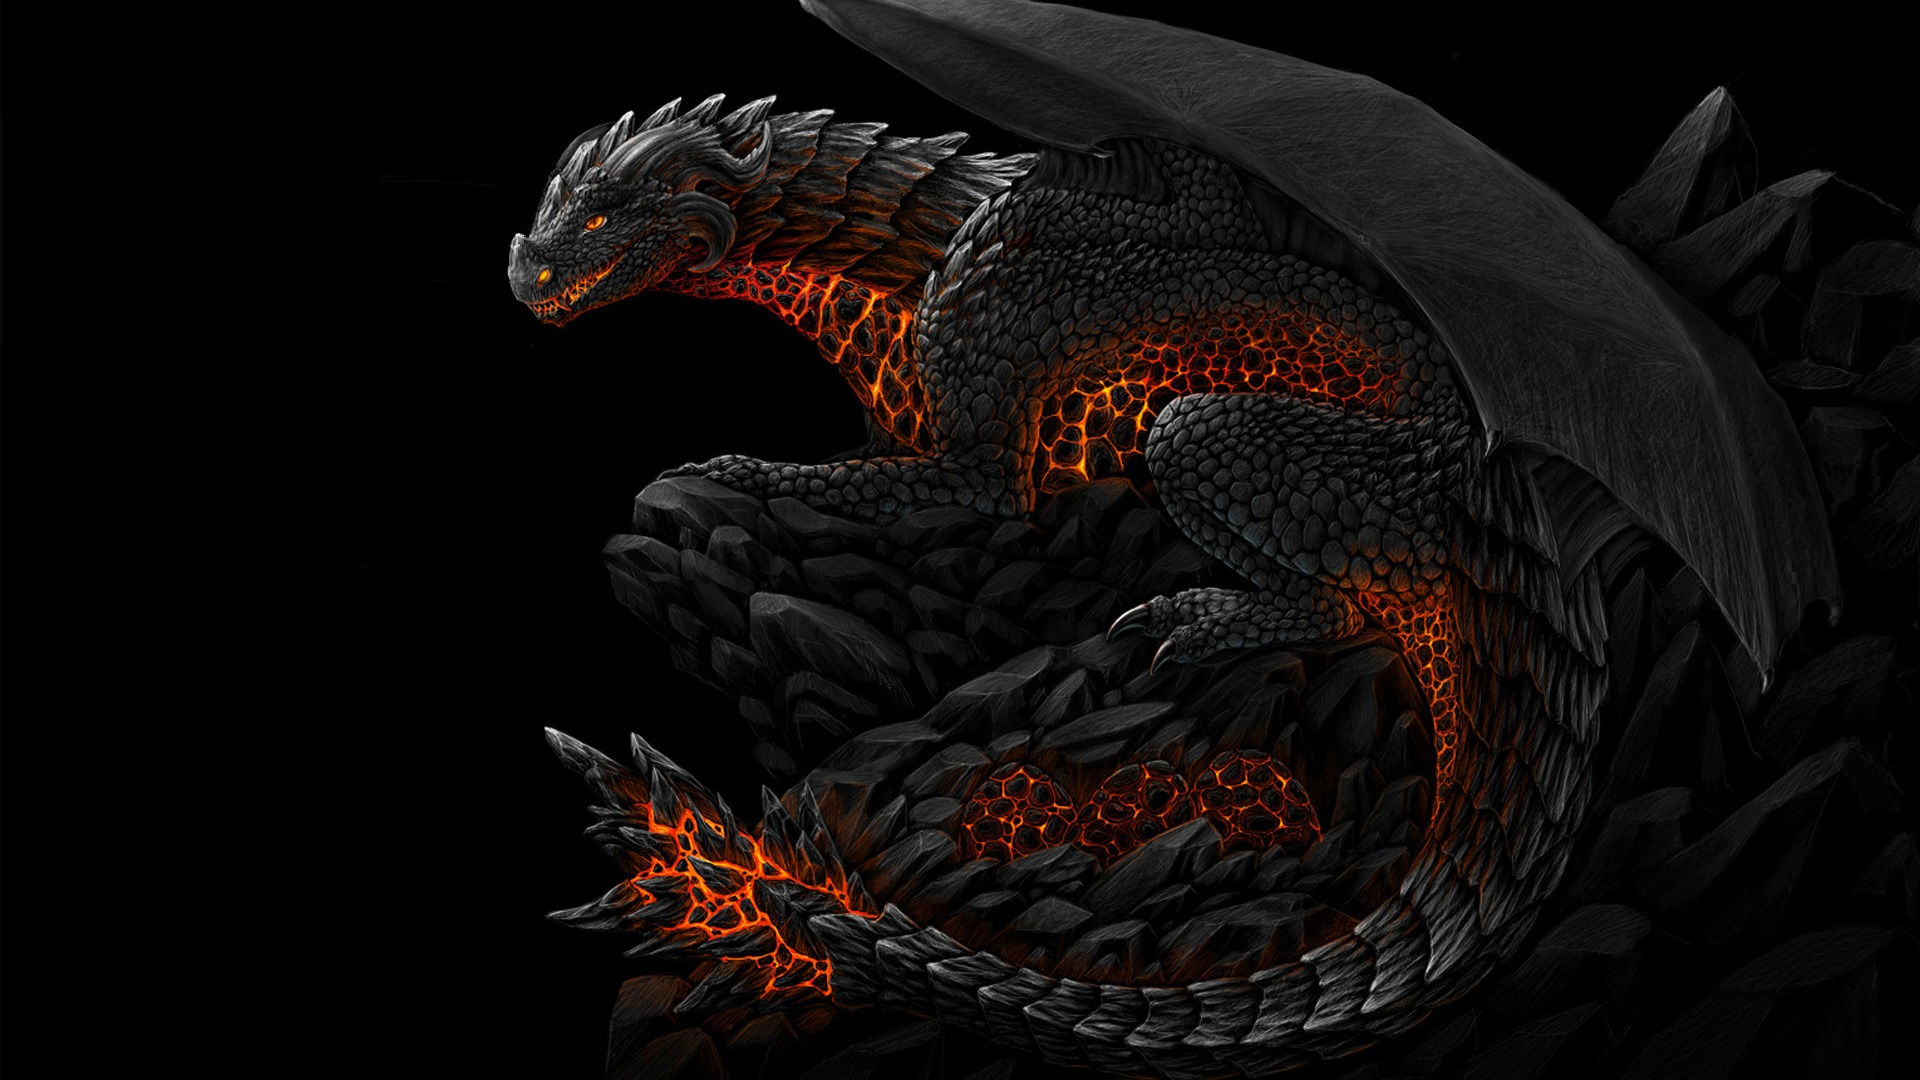 Best 45+ Dragon Wallpaper on HipWallpaper Awesome Dragon